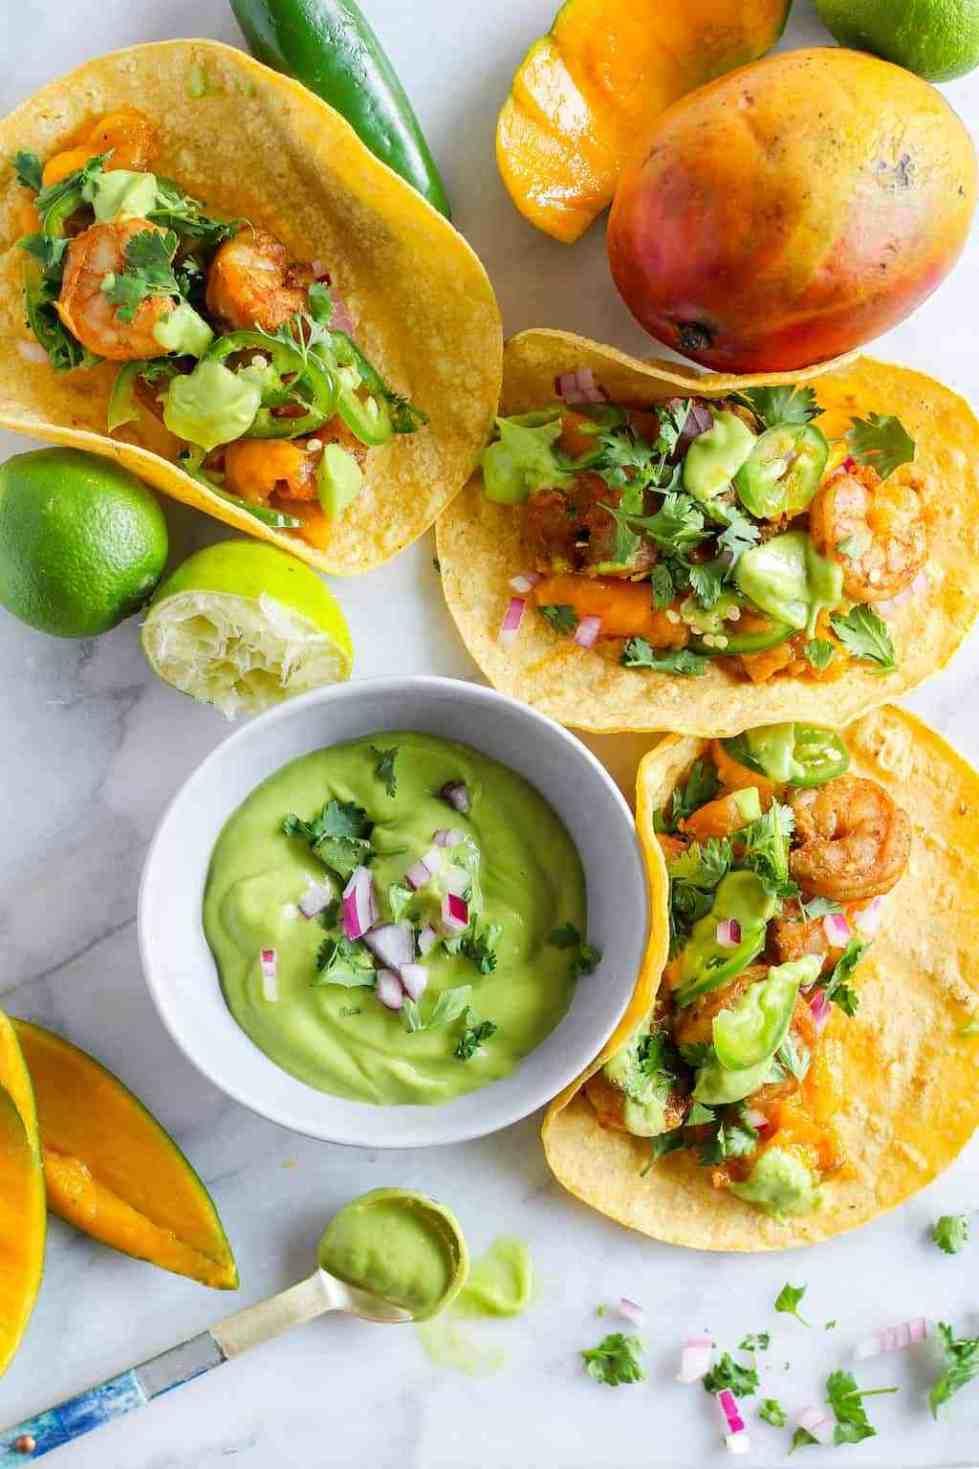 Grilled shrimp mango tacos with small bowl of green avocado sauce.